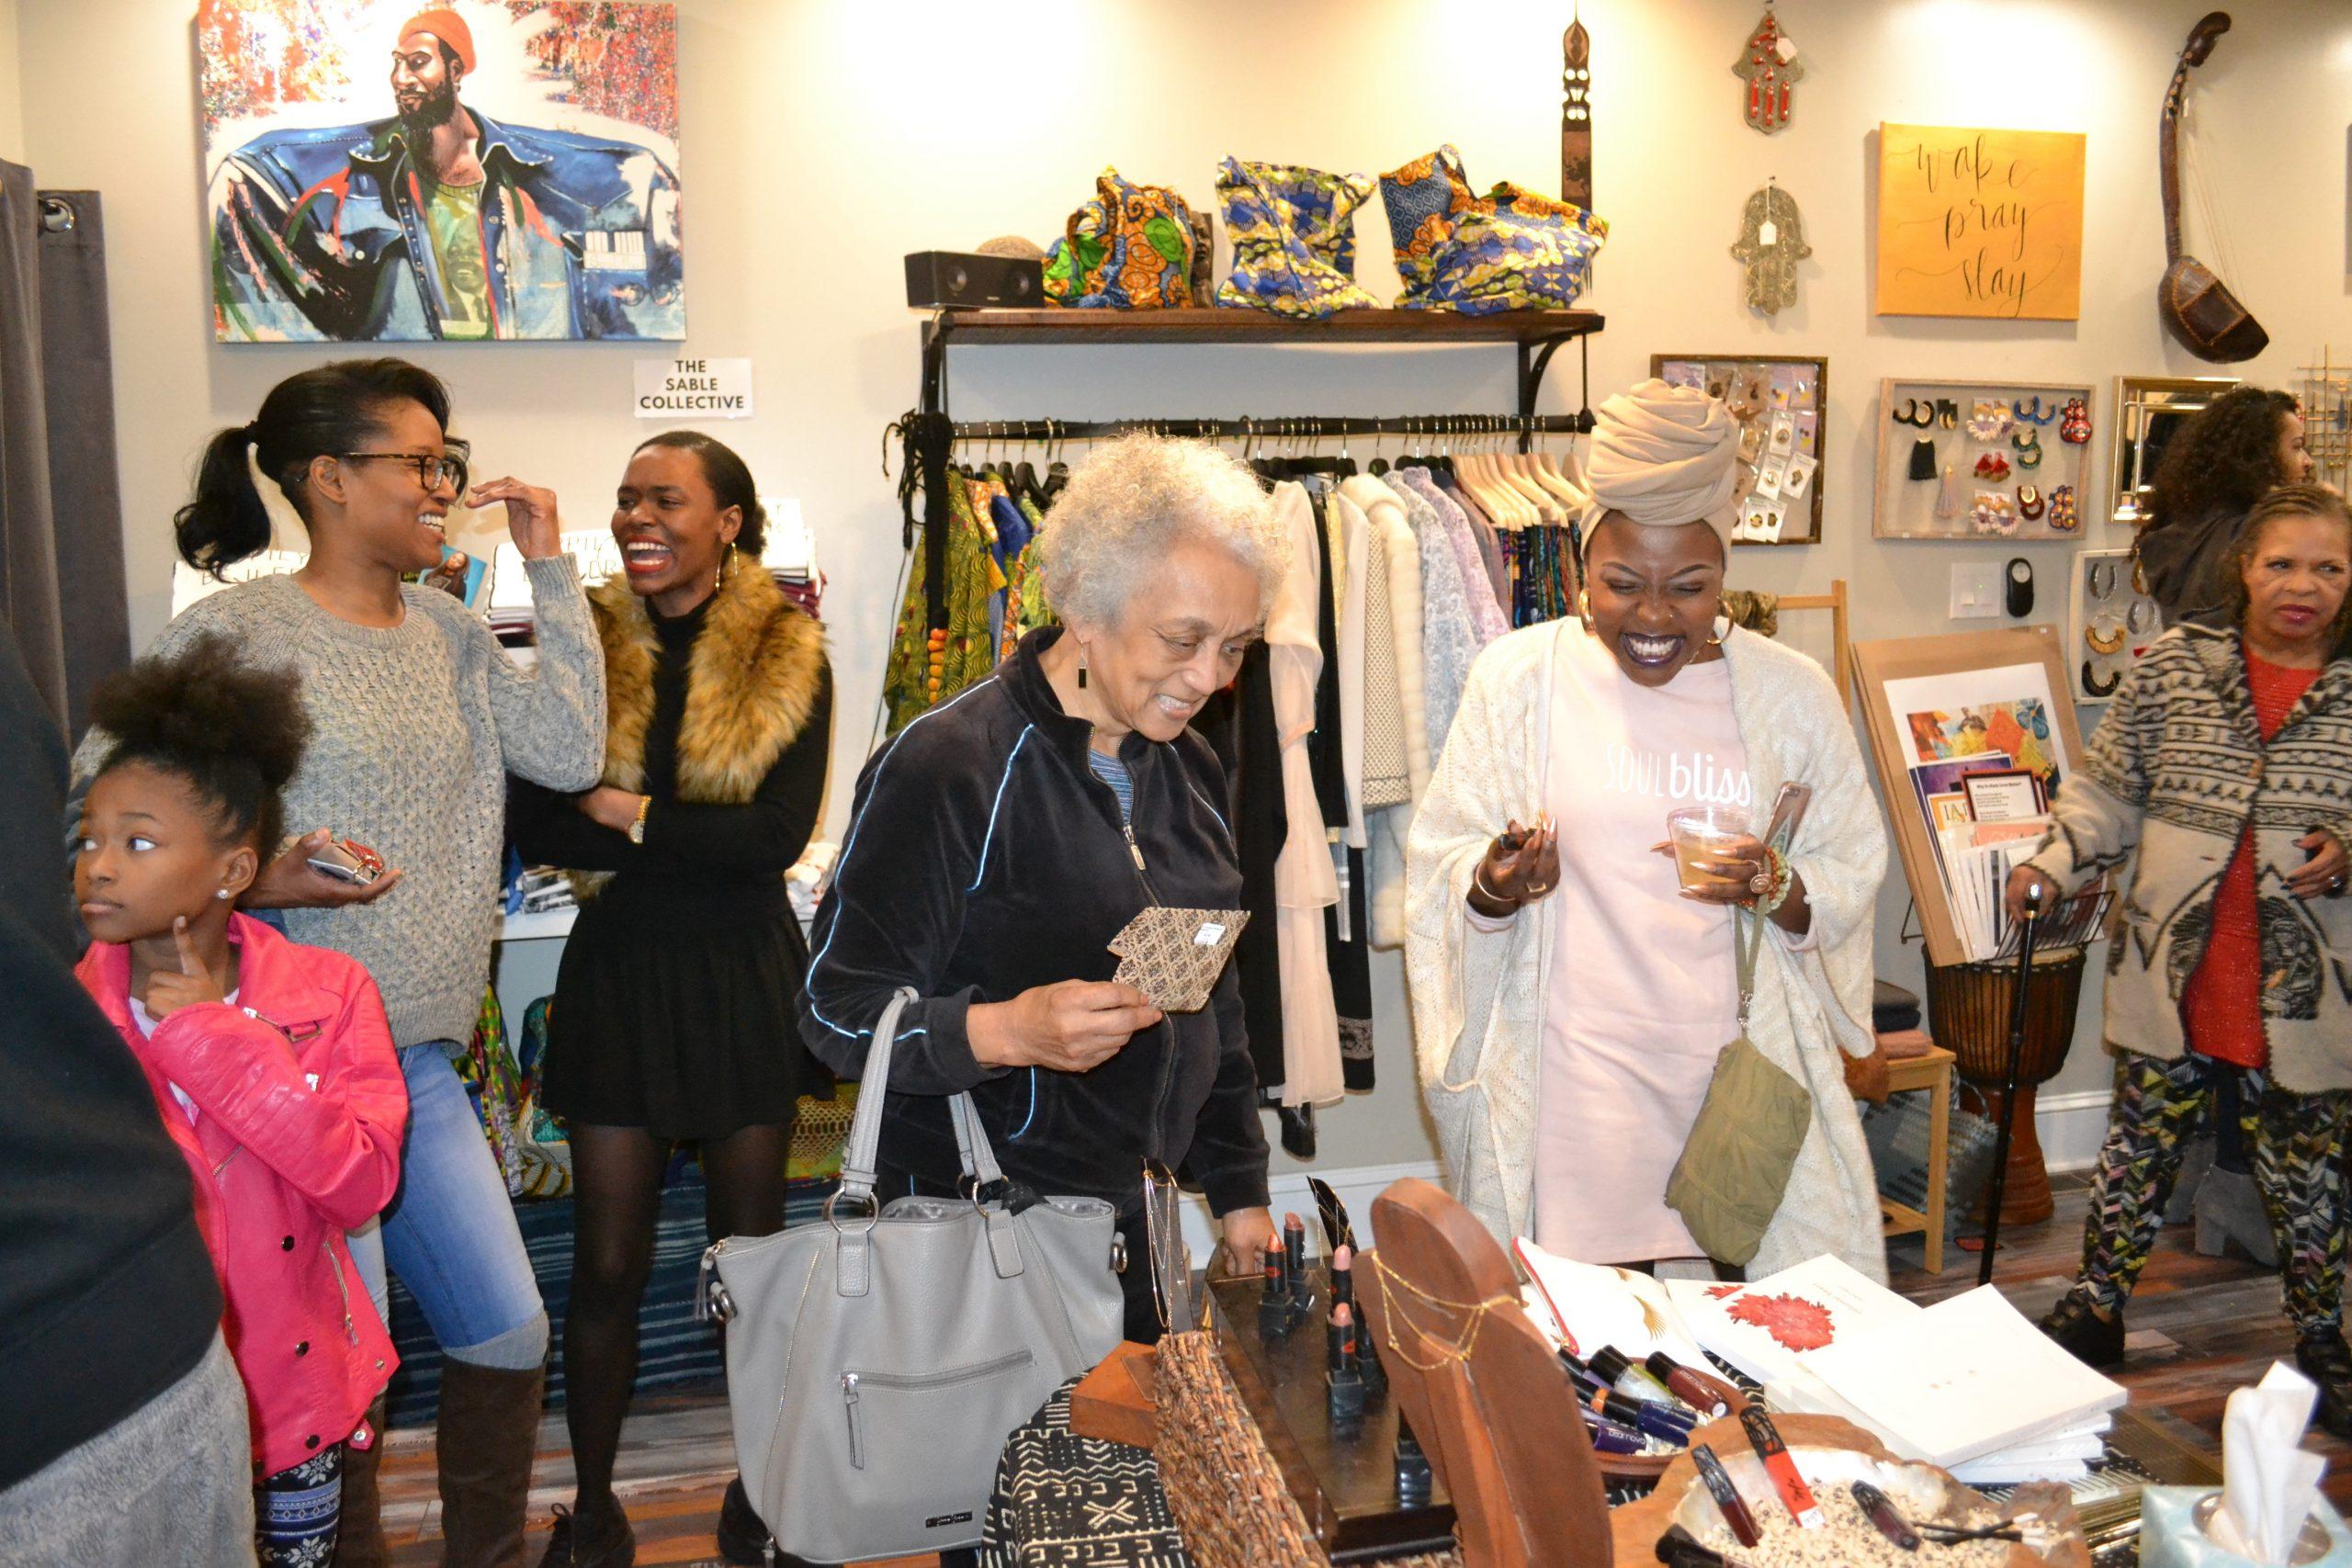 The Sable Collective: A Cooperative Boutique